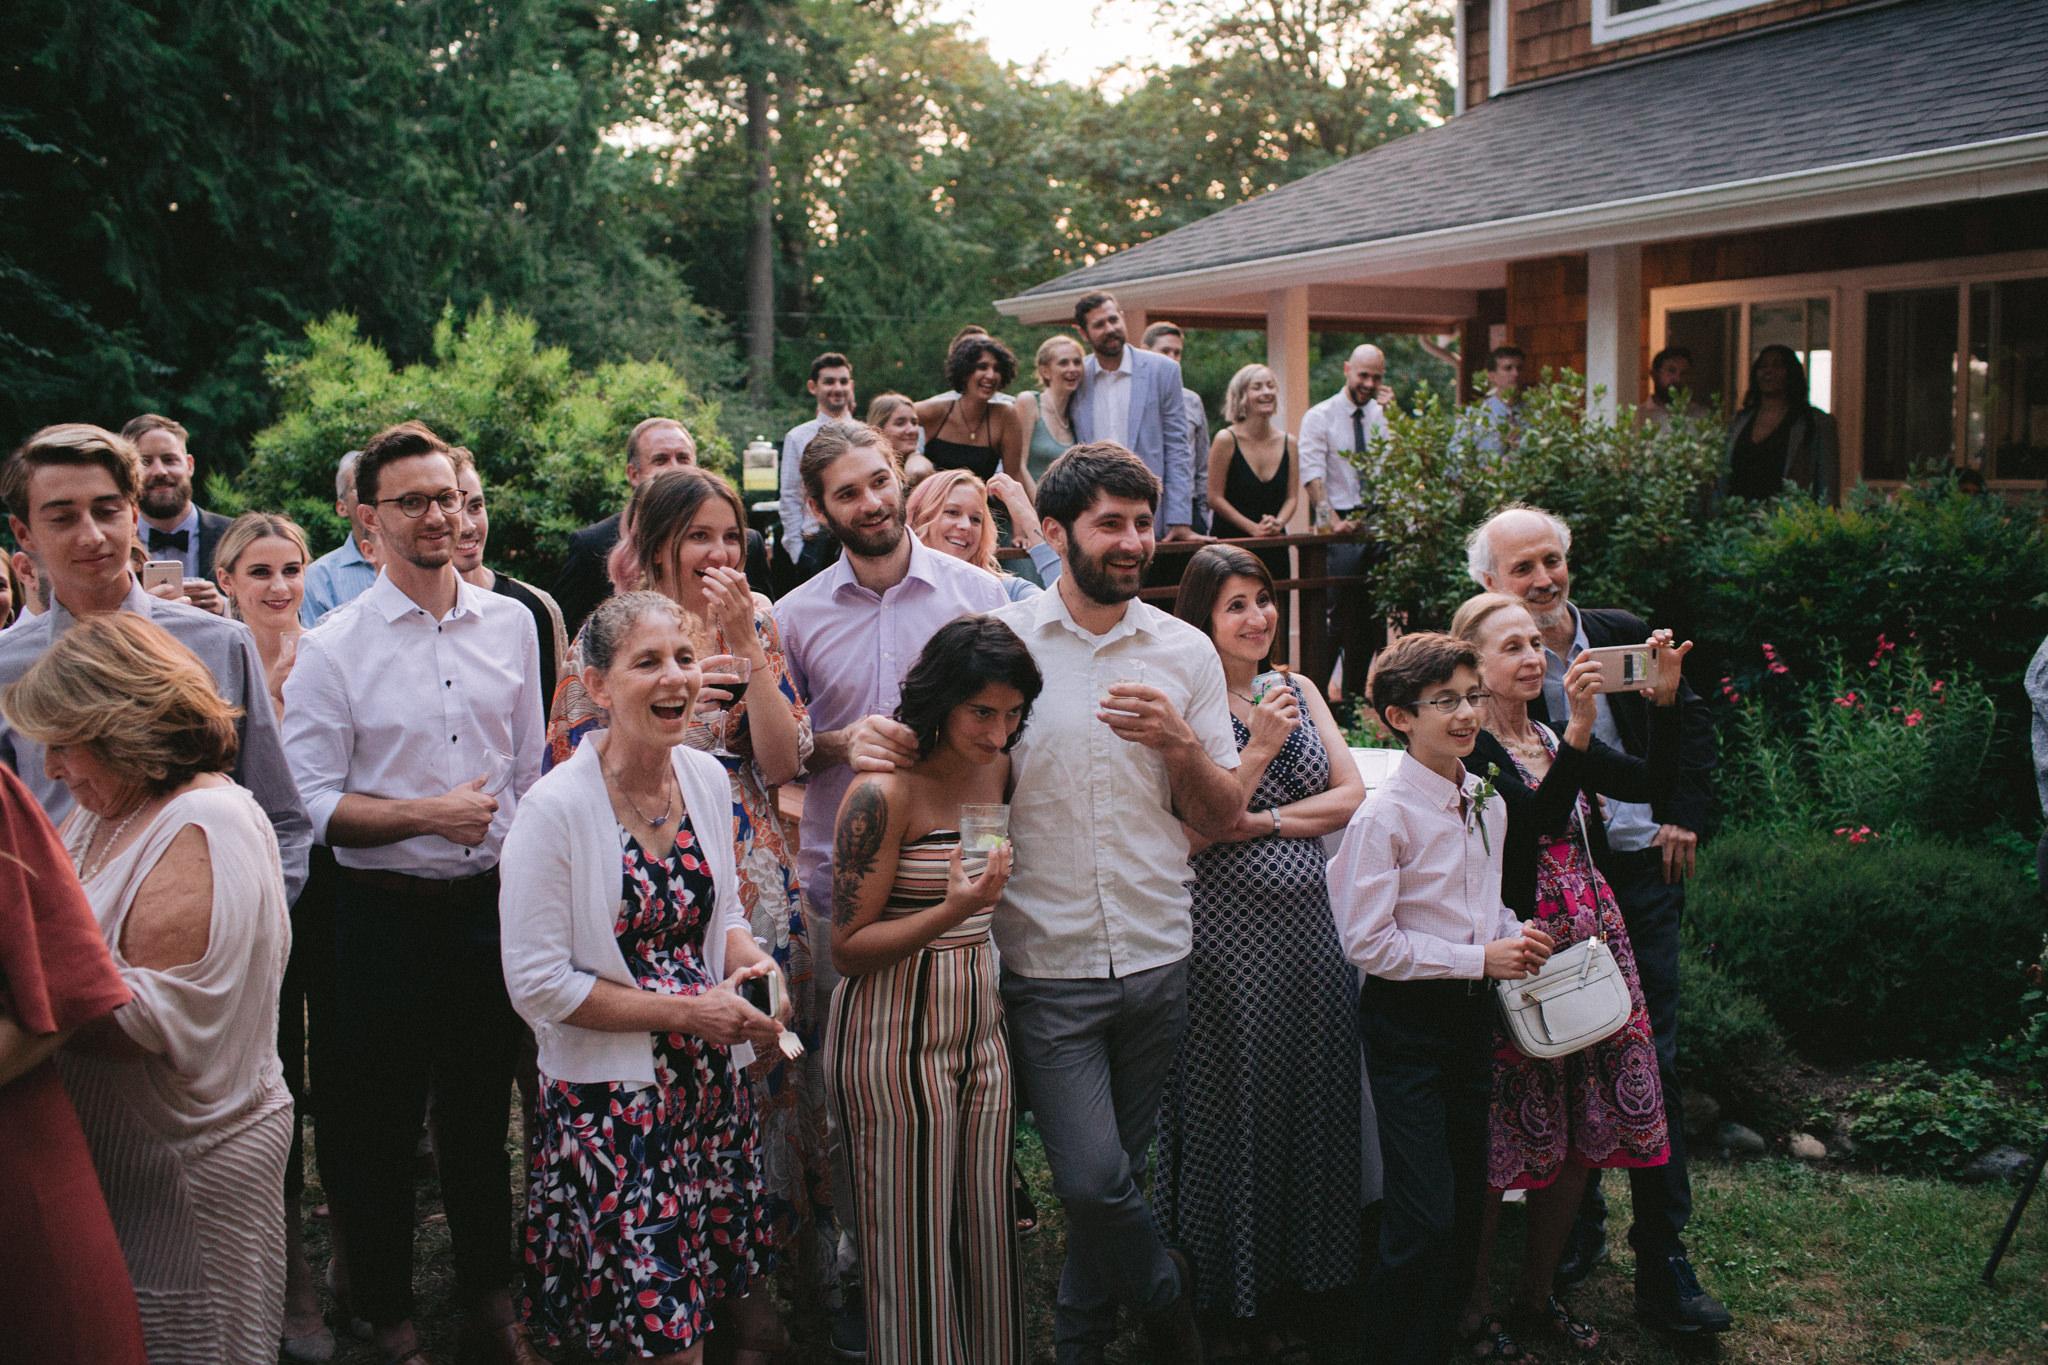 Backyard-Bainbridge-Island-Wedding-Alycia-Lovell-Photography-202.JPG